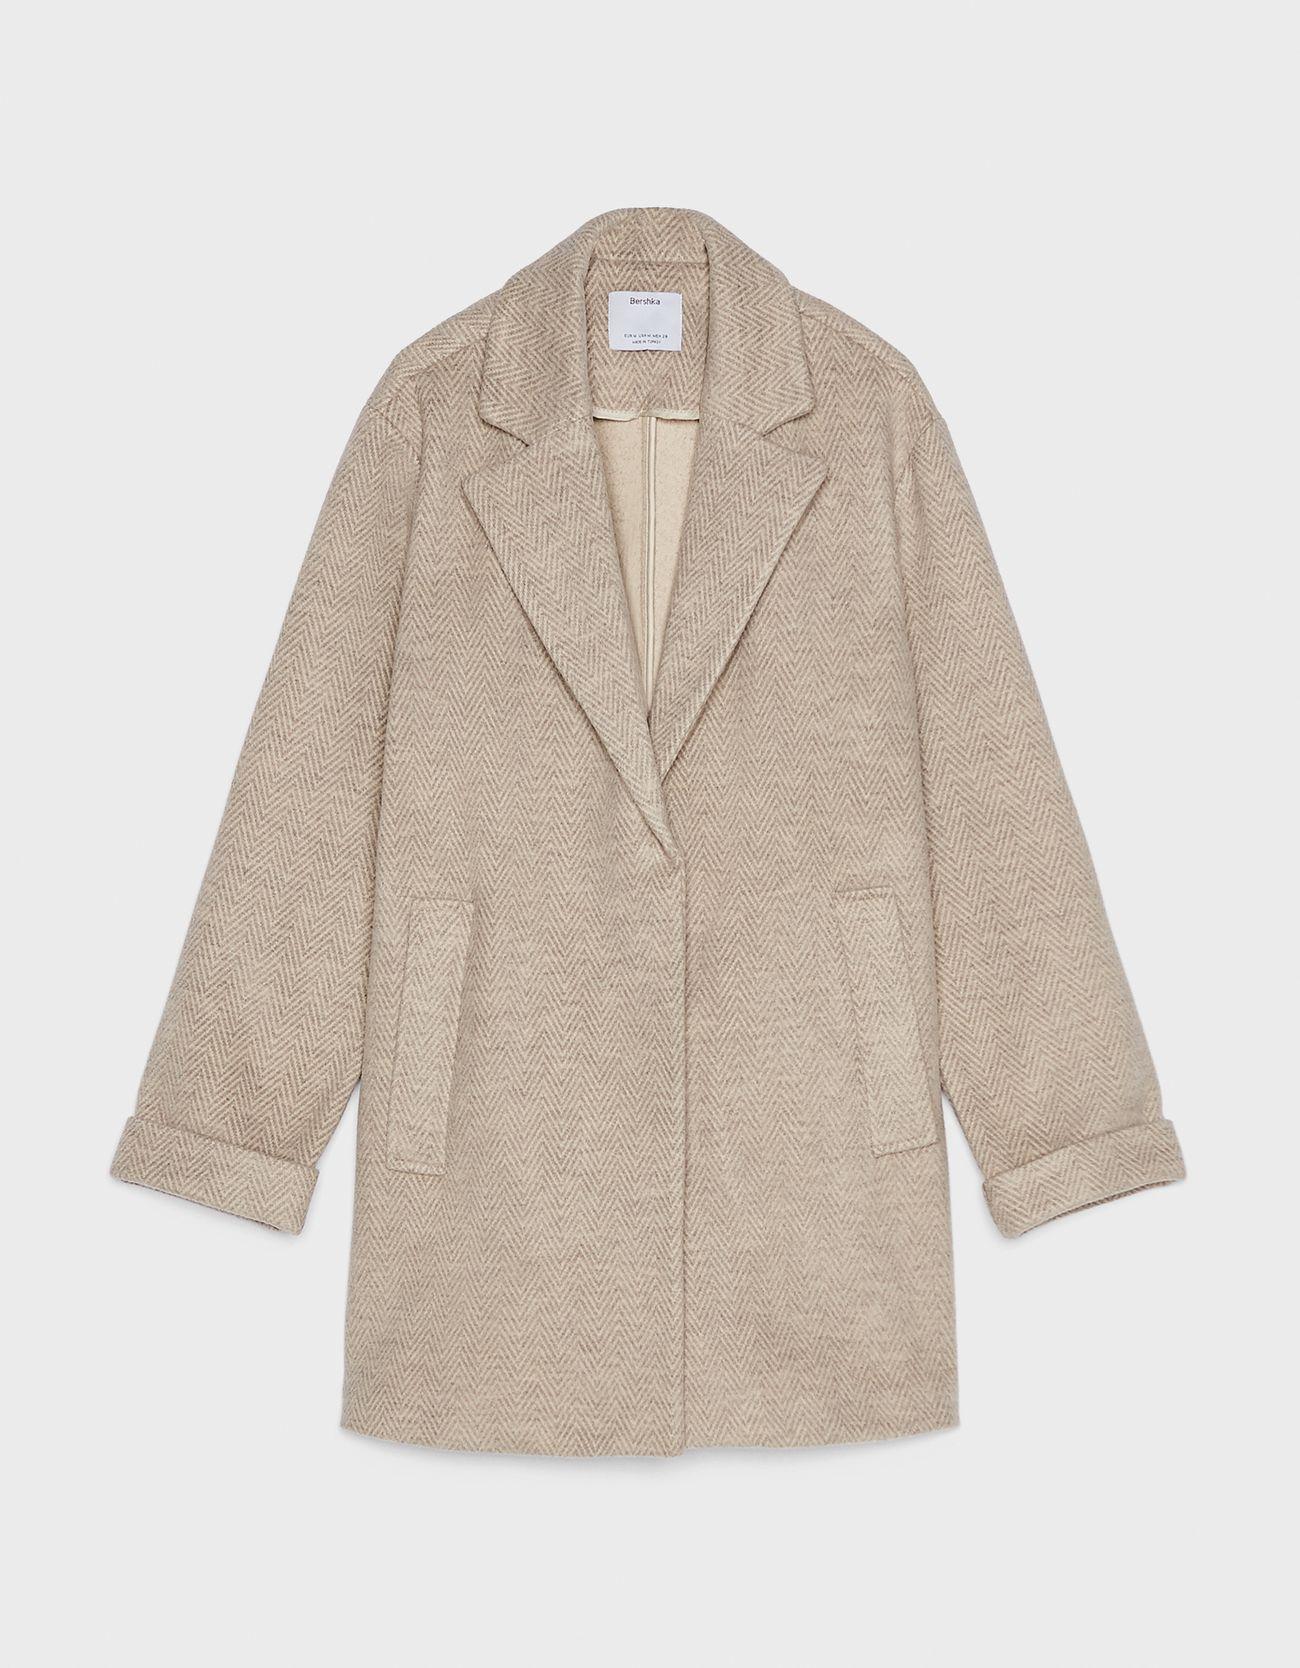 Пальто в мужском стиле Верблюжий Bershka